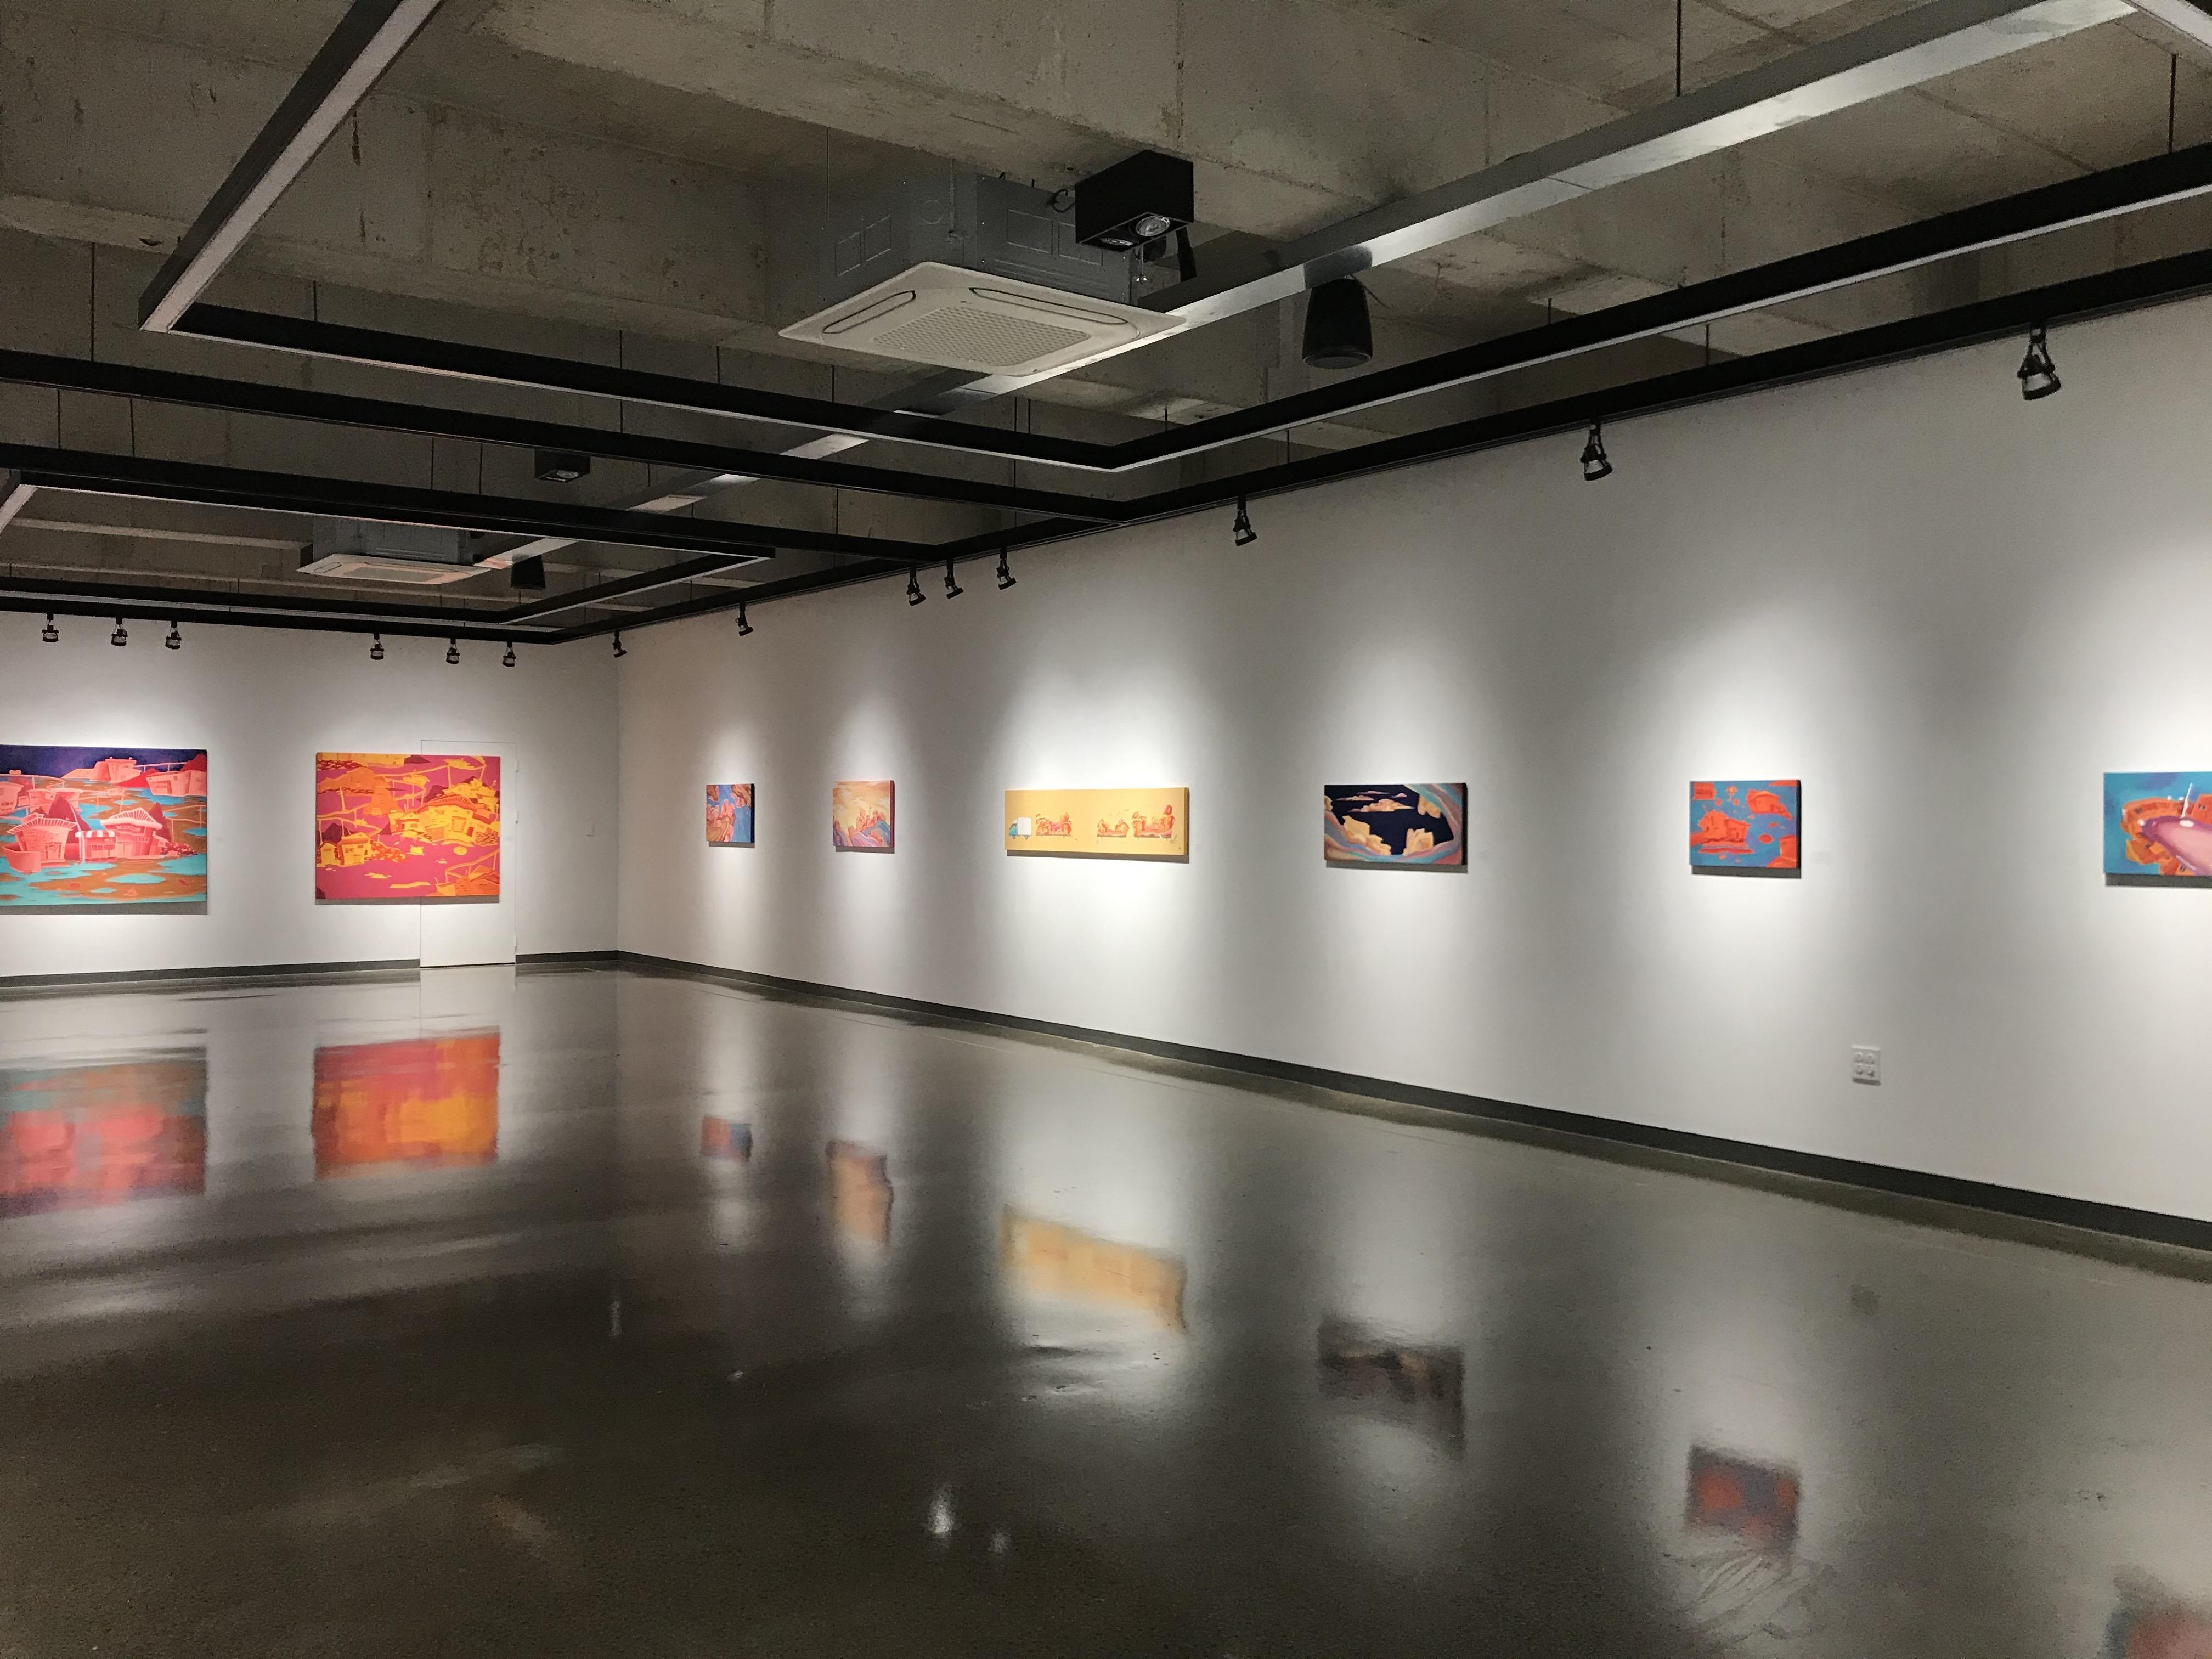 http://www.deyoungmuseum.co.kr/bs/se2/imgup/1606290771KakaoTalk_20201015_133540087_02.jpg